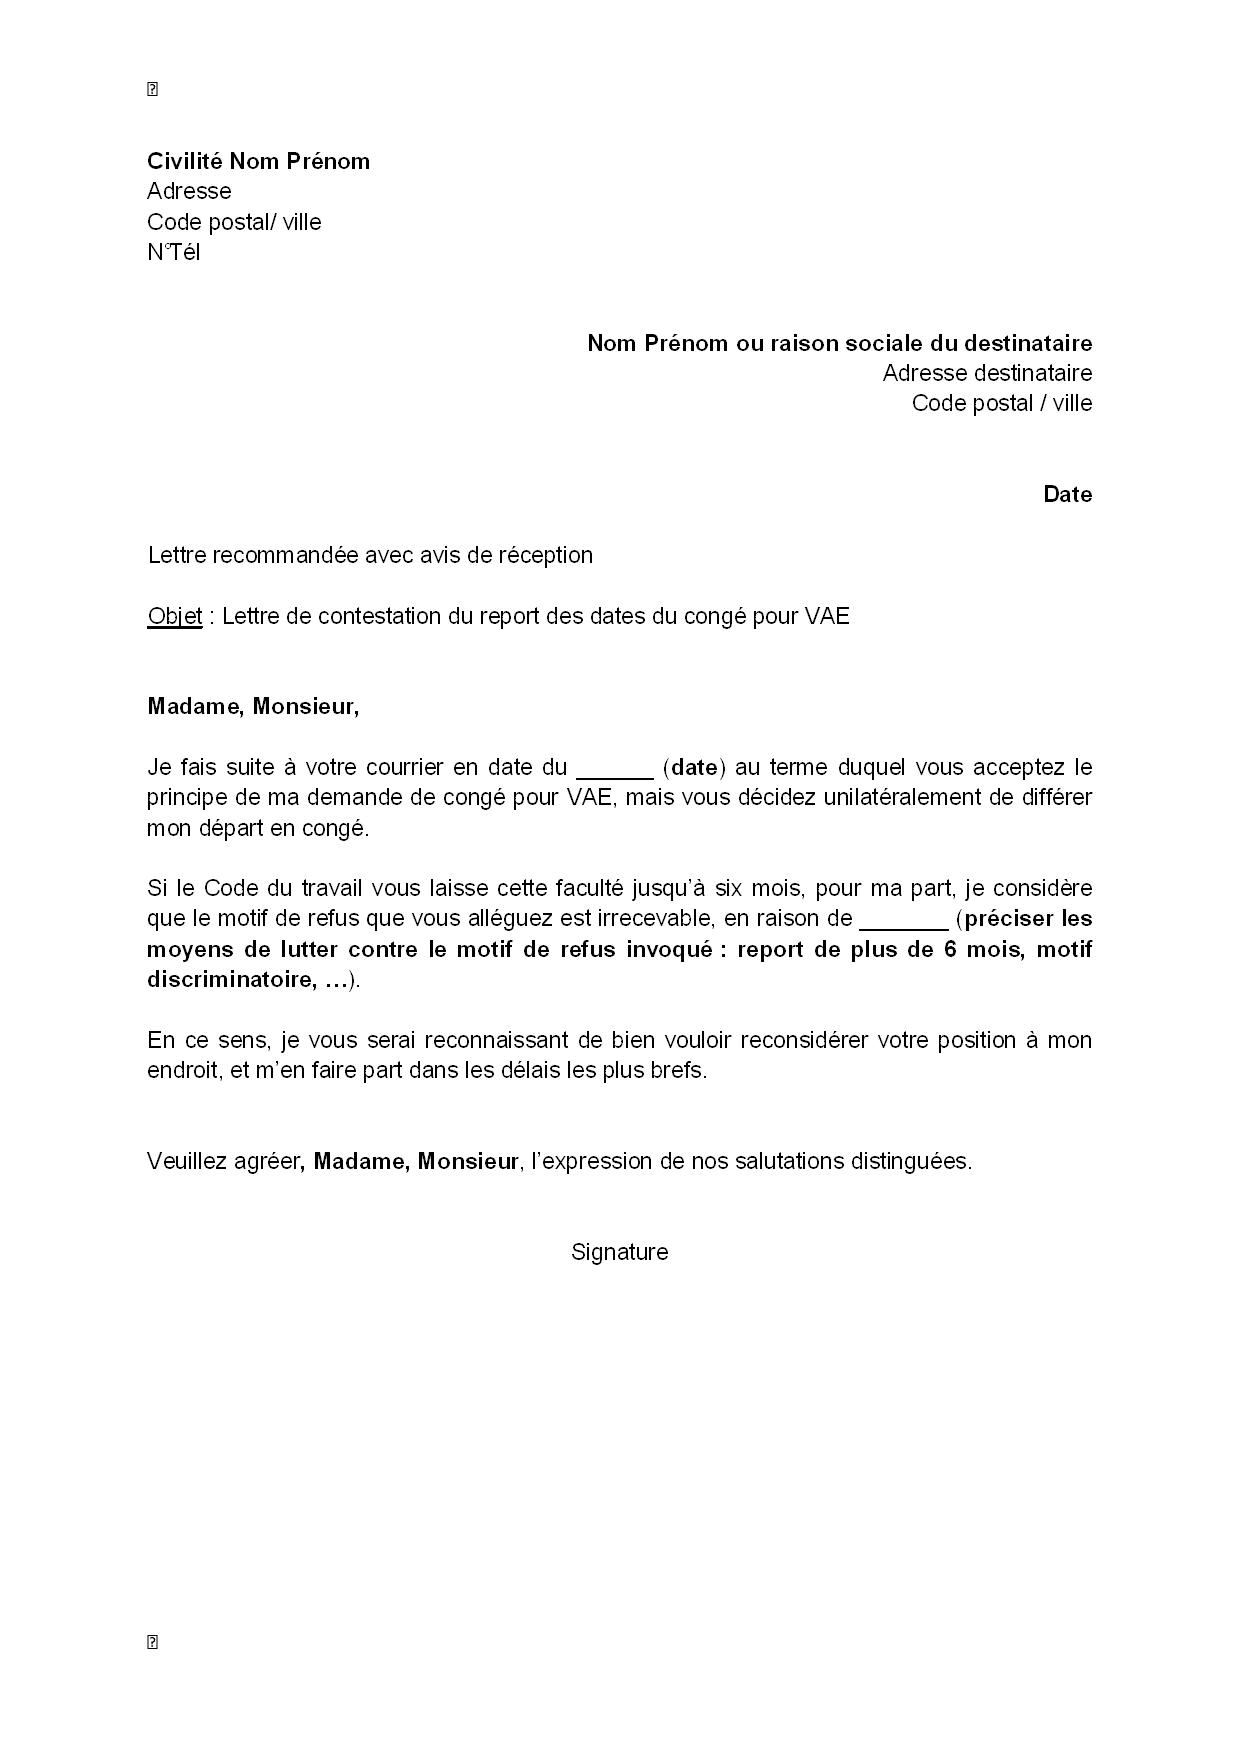 exemple gratuit de lettre contestation  par salari u00e9  report dates cong u00e9 vae